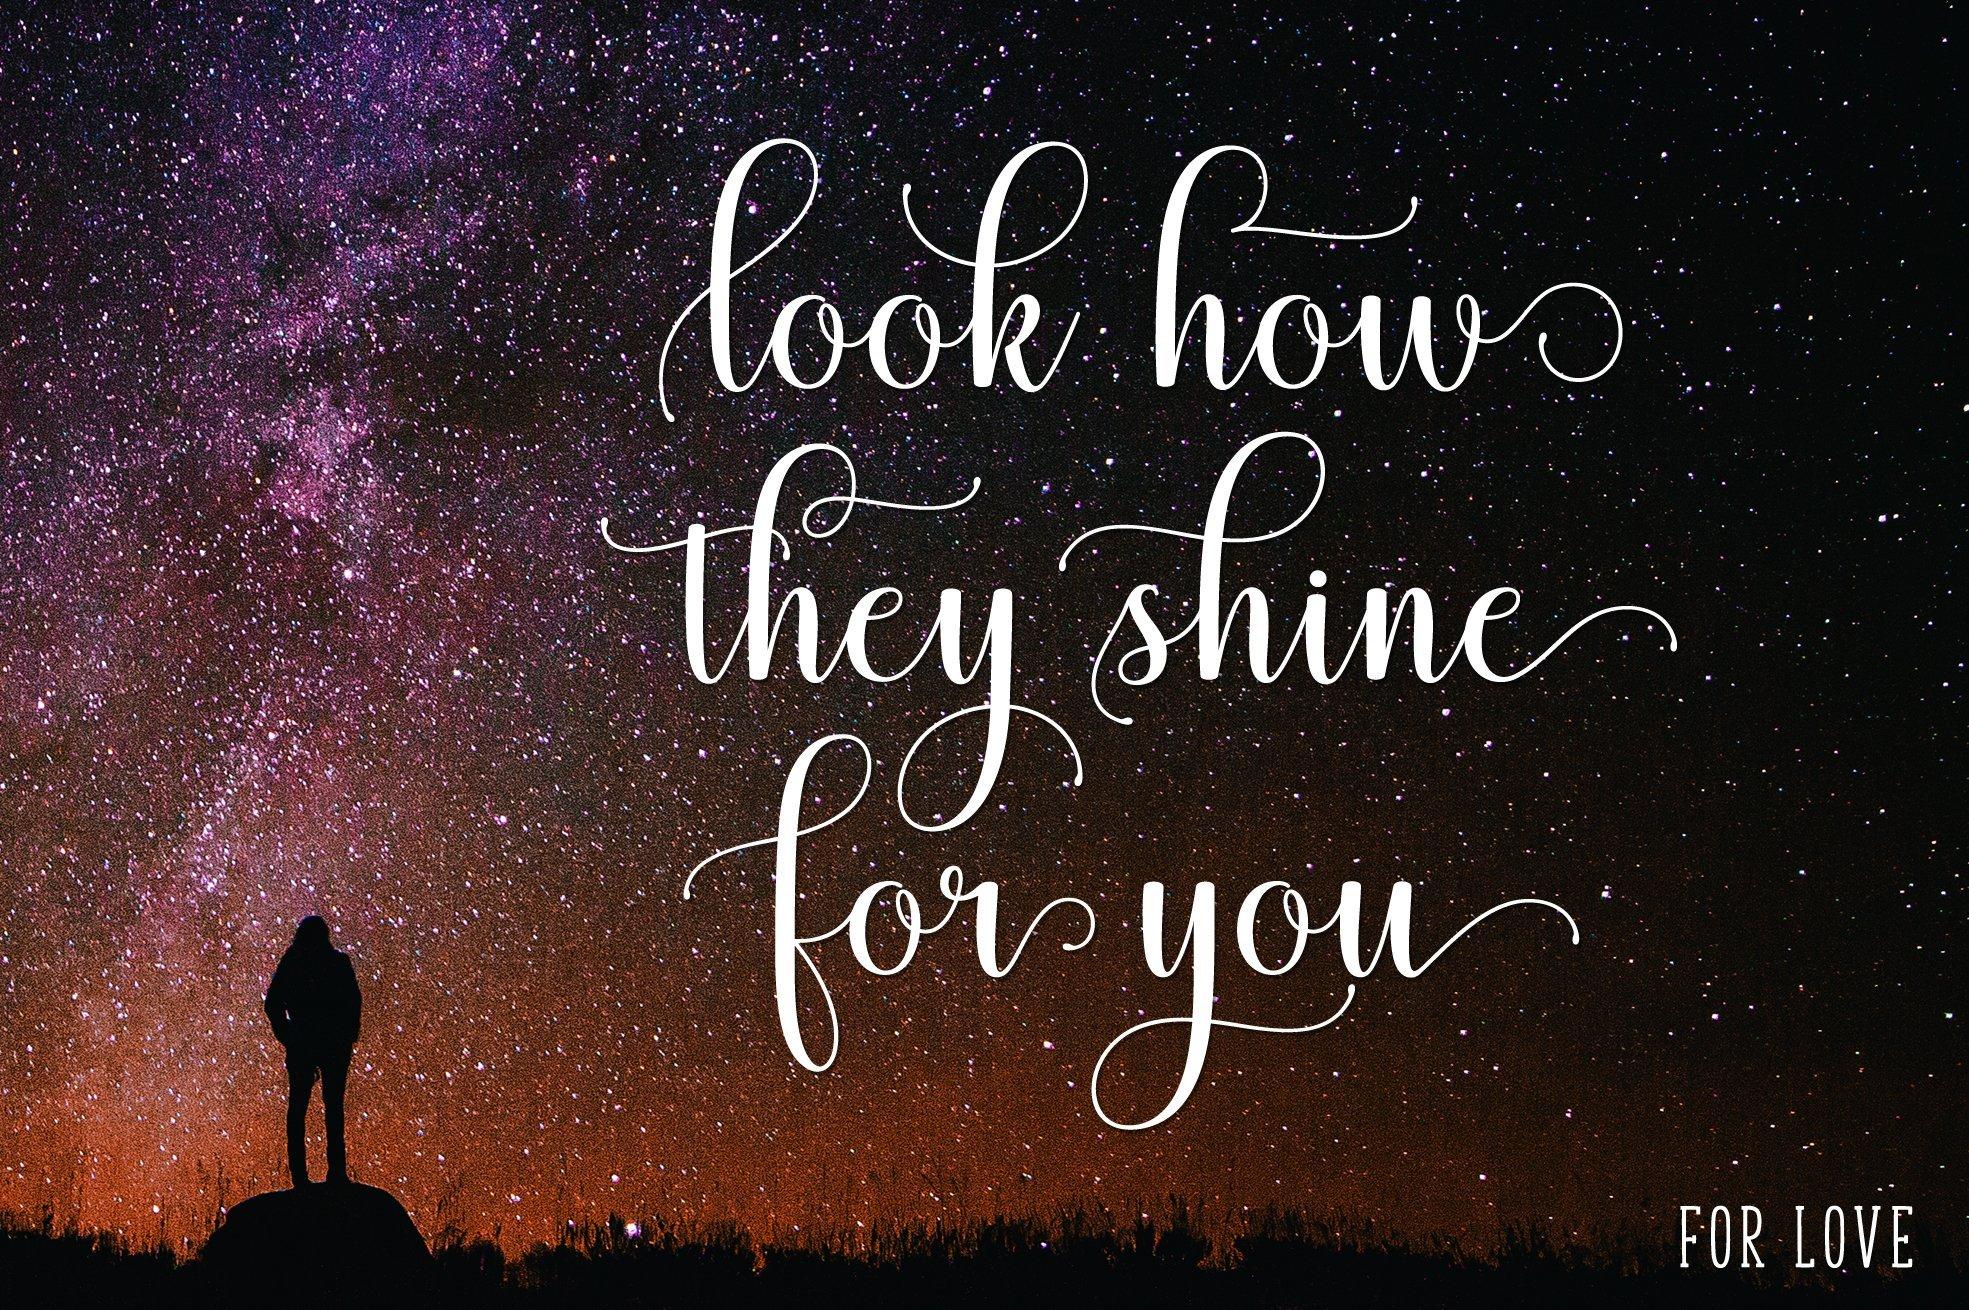 Romantic phrases around the star sky.